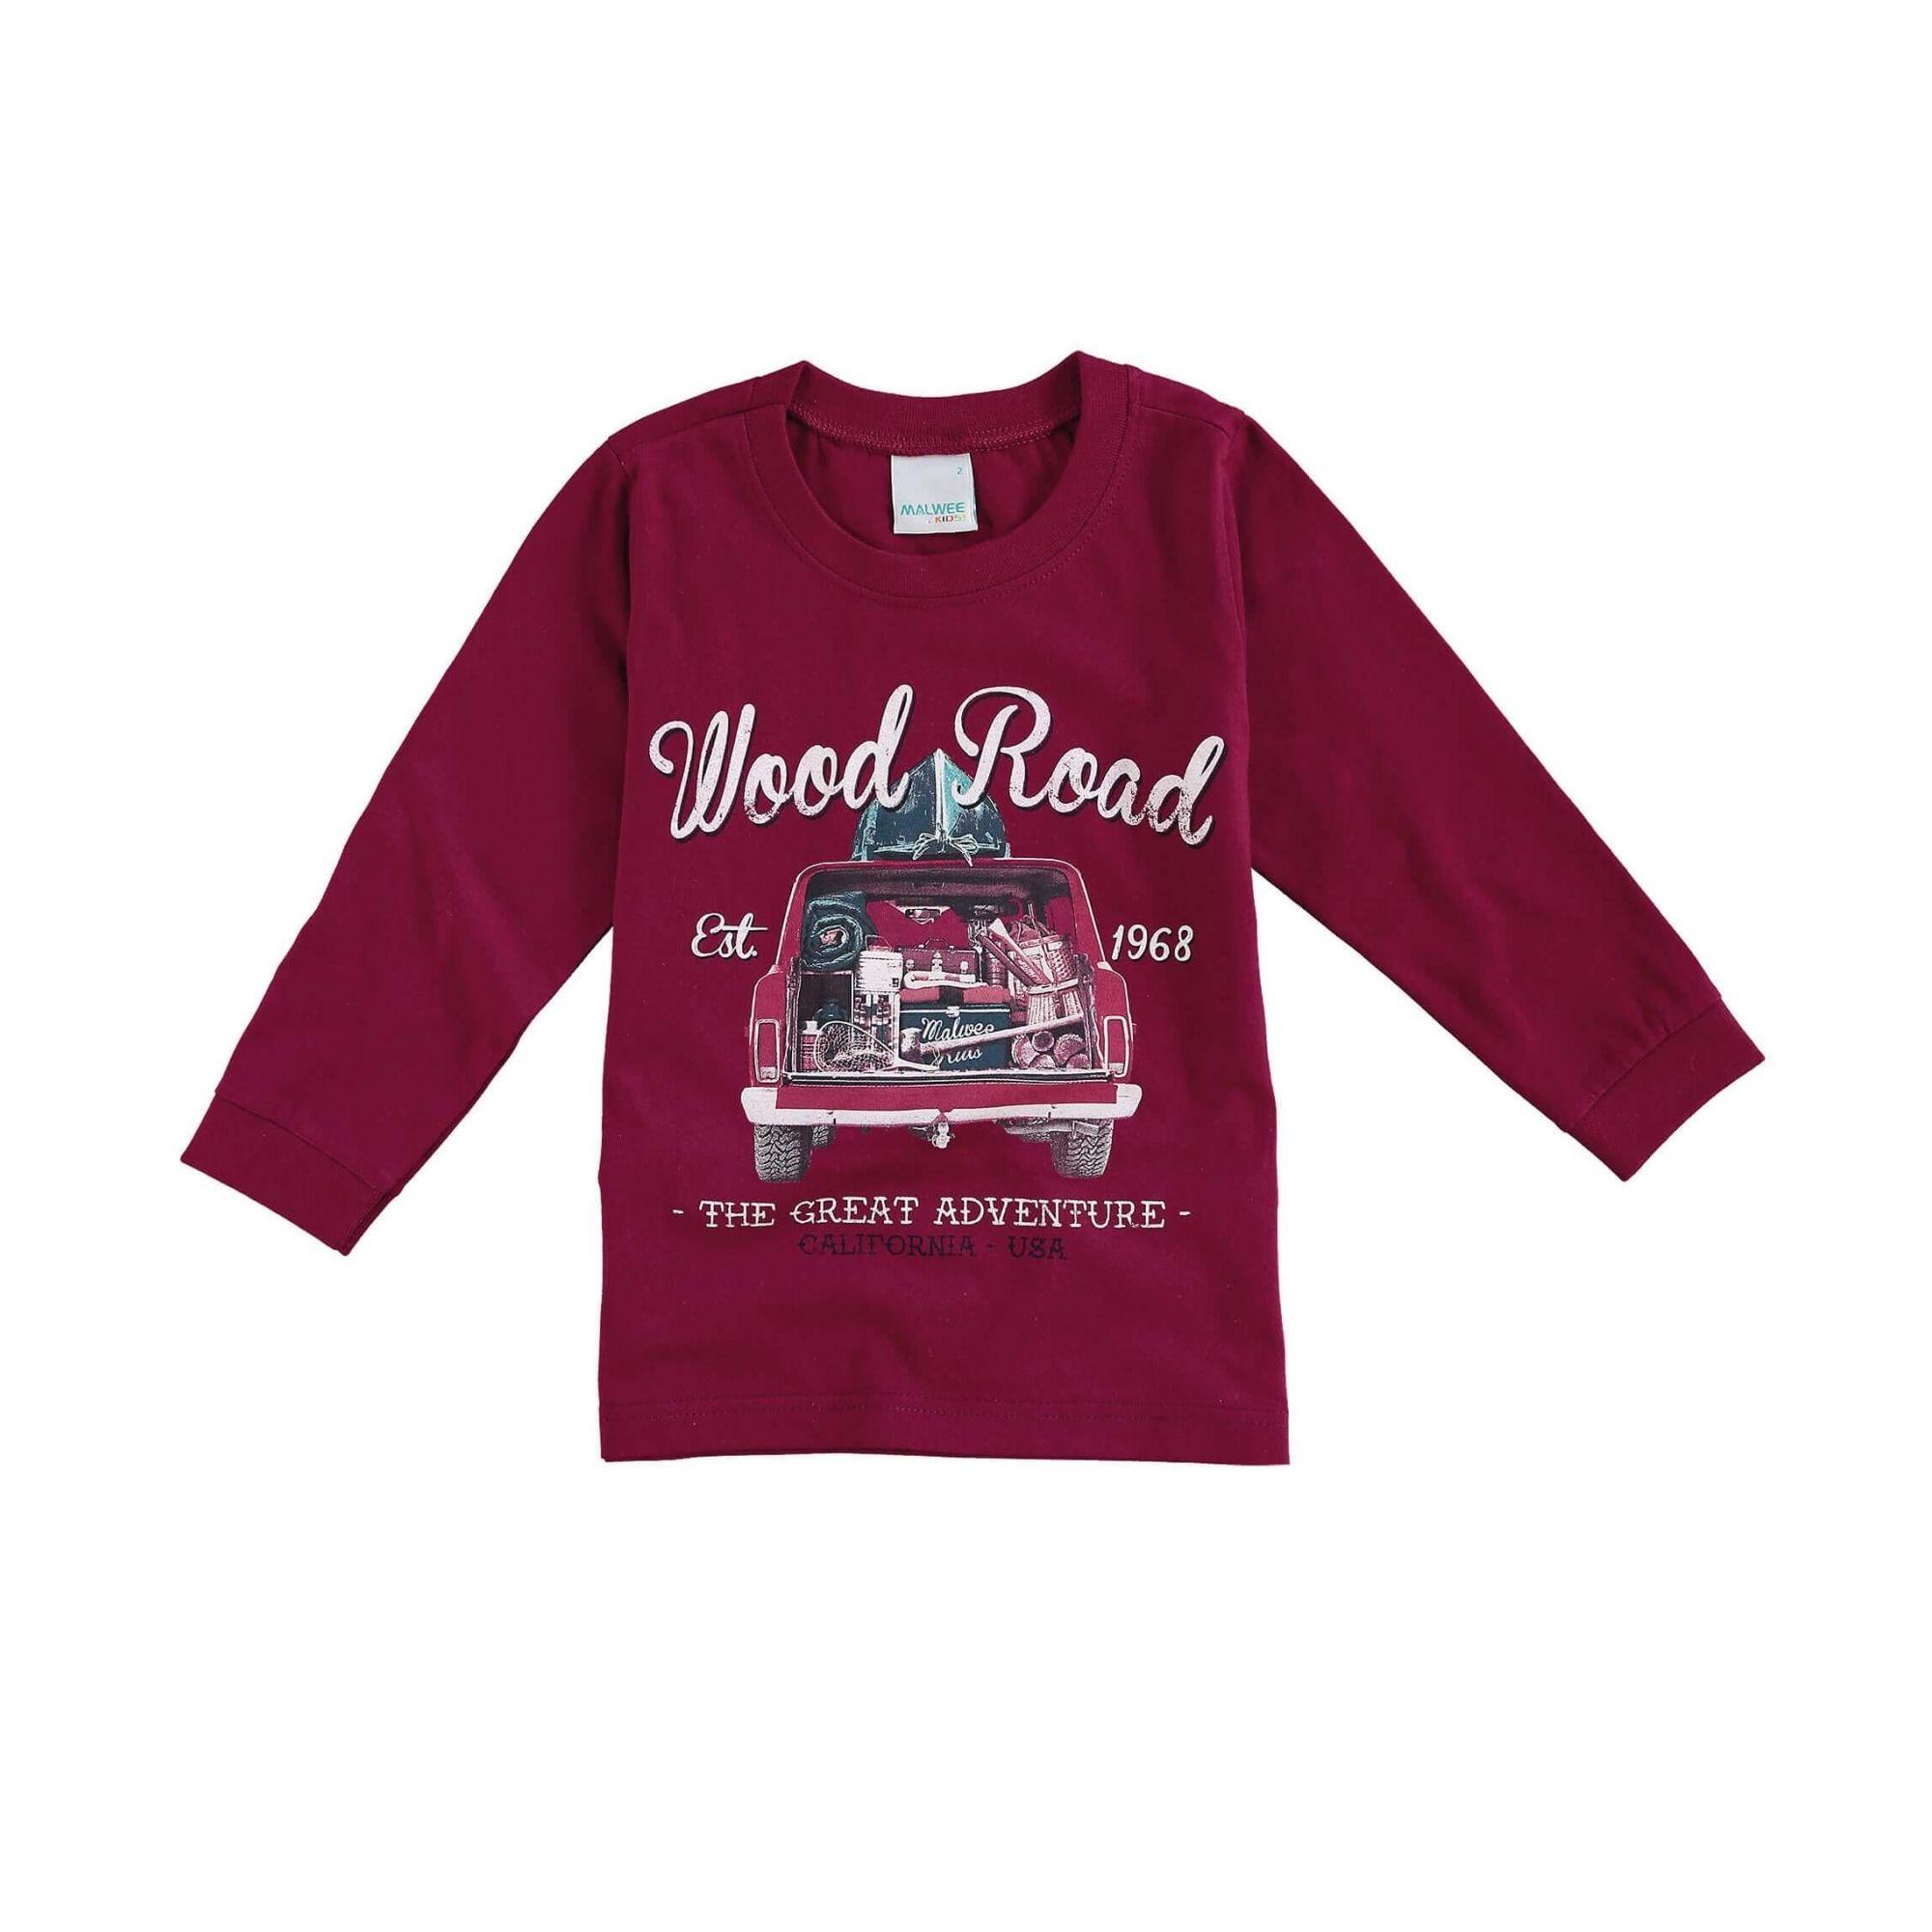 ef489f16f Camiseta Infantil Masculina Inverno Bordô Wood Road Malwee